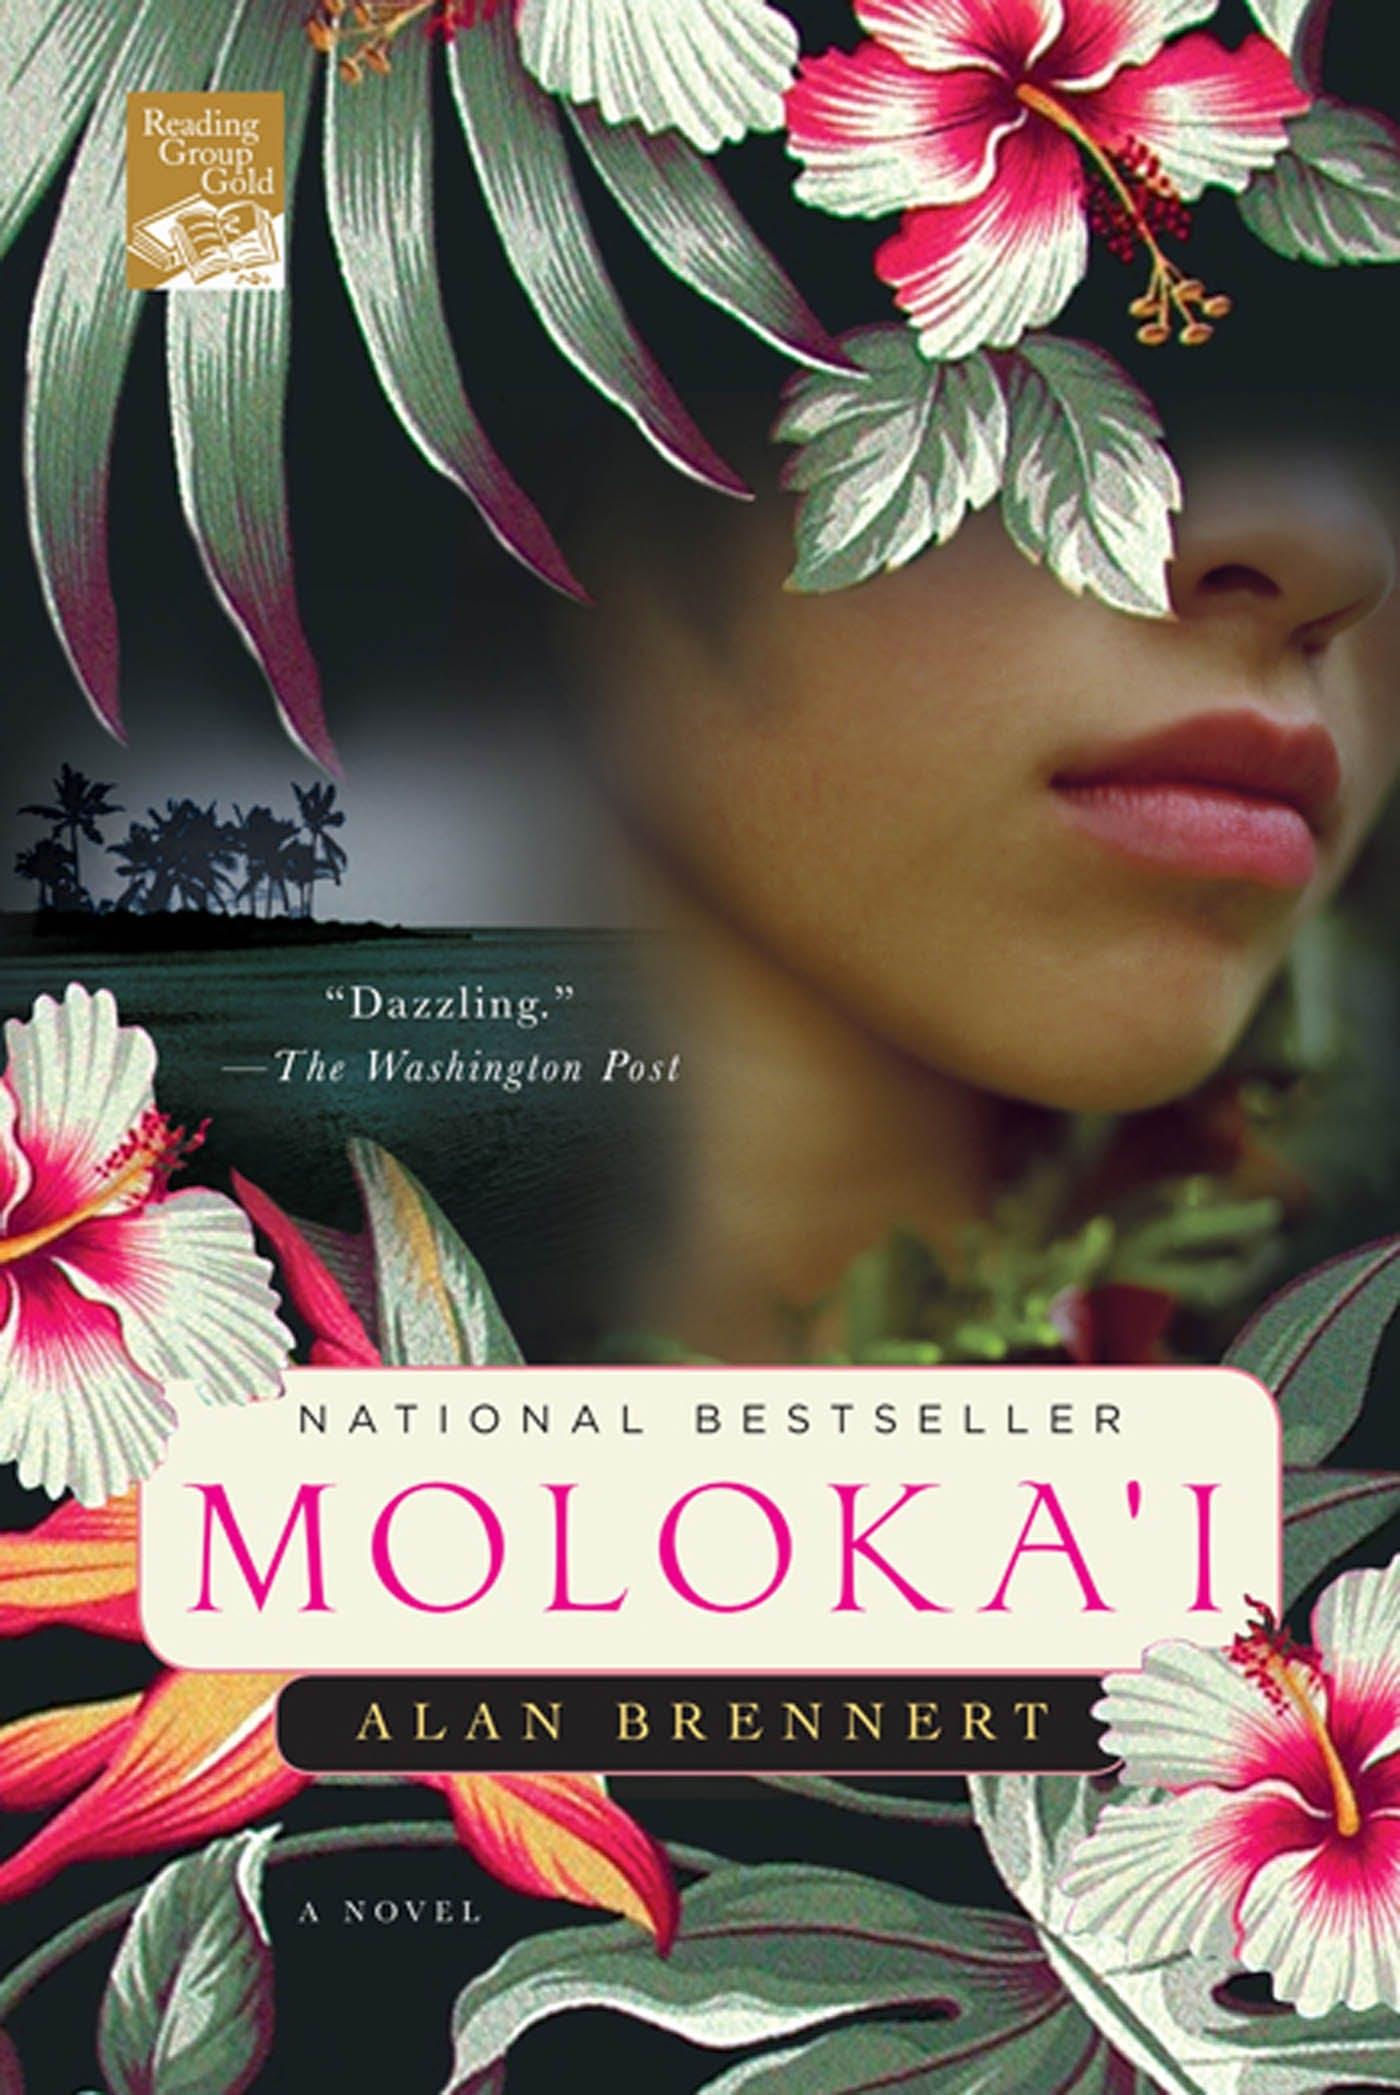 Image of Moloka'i